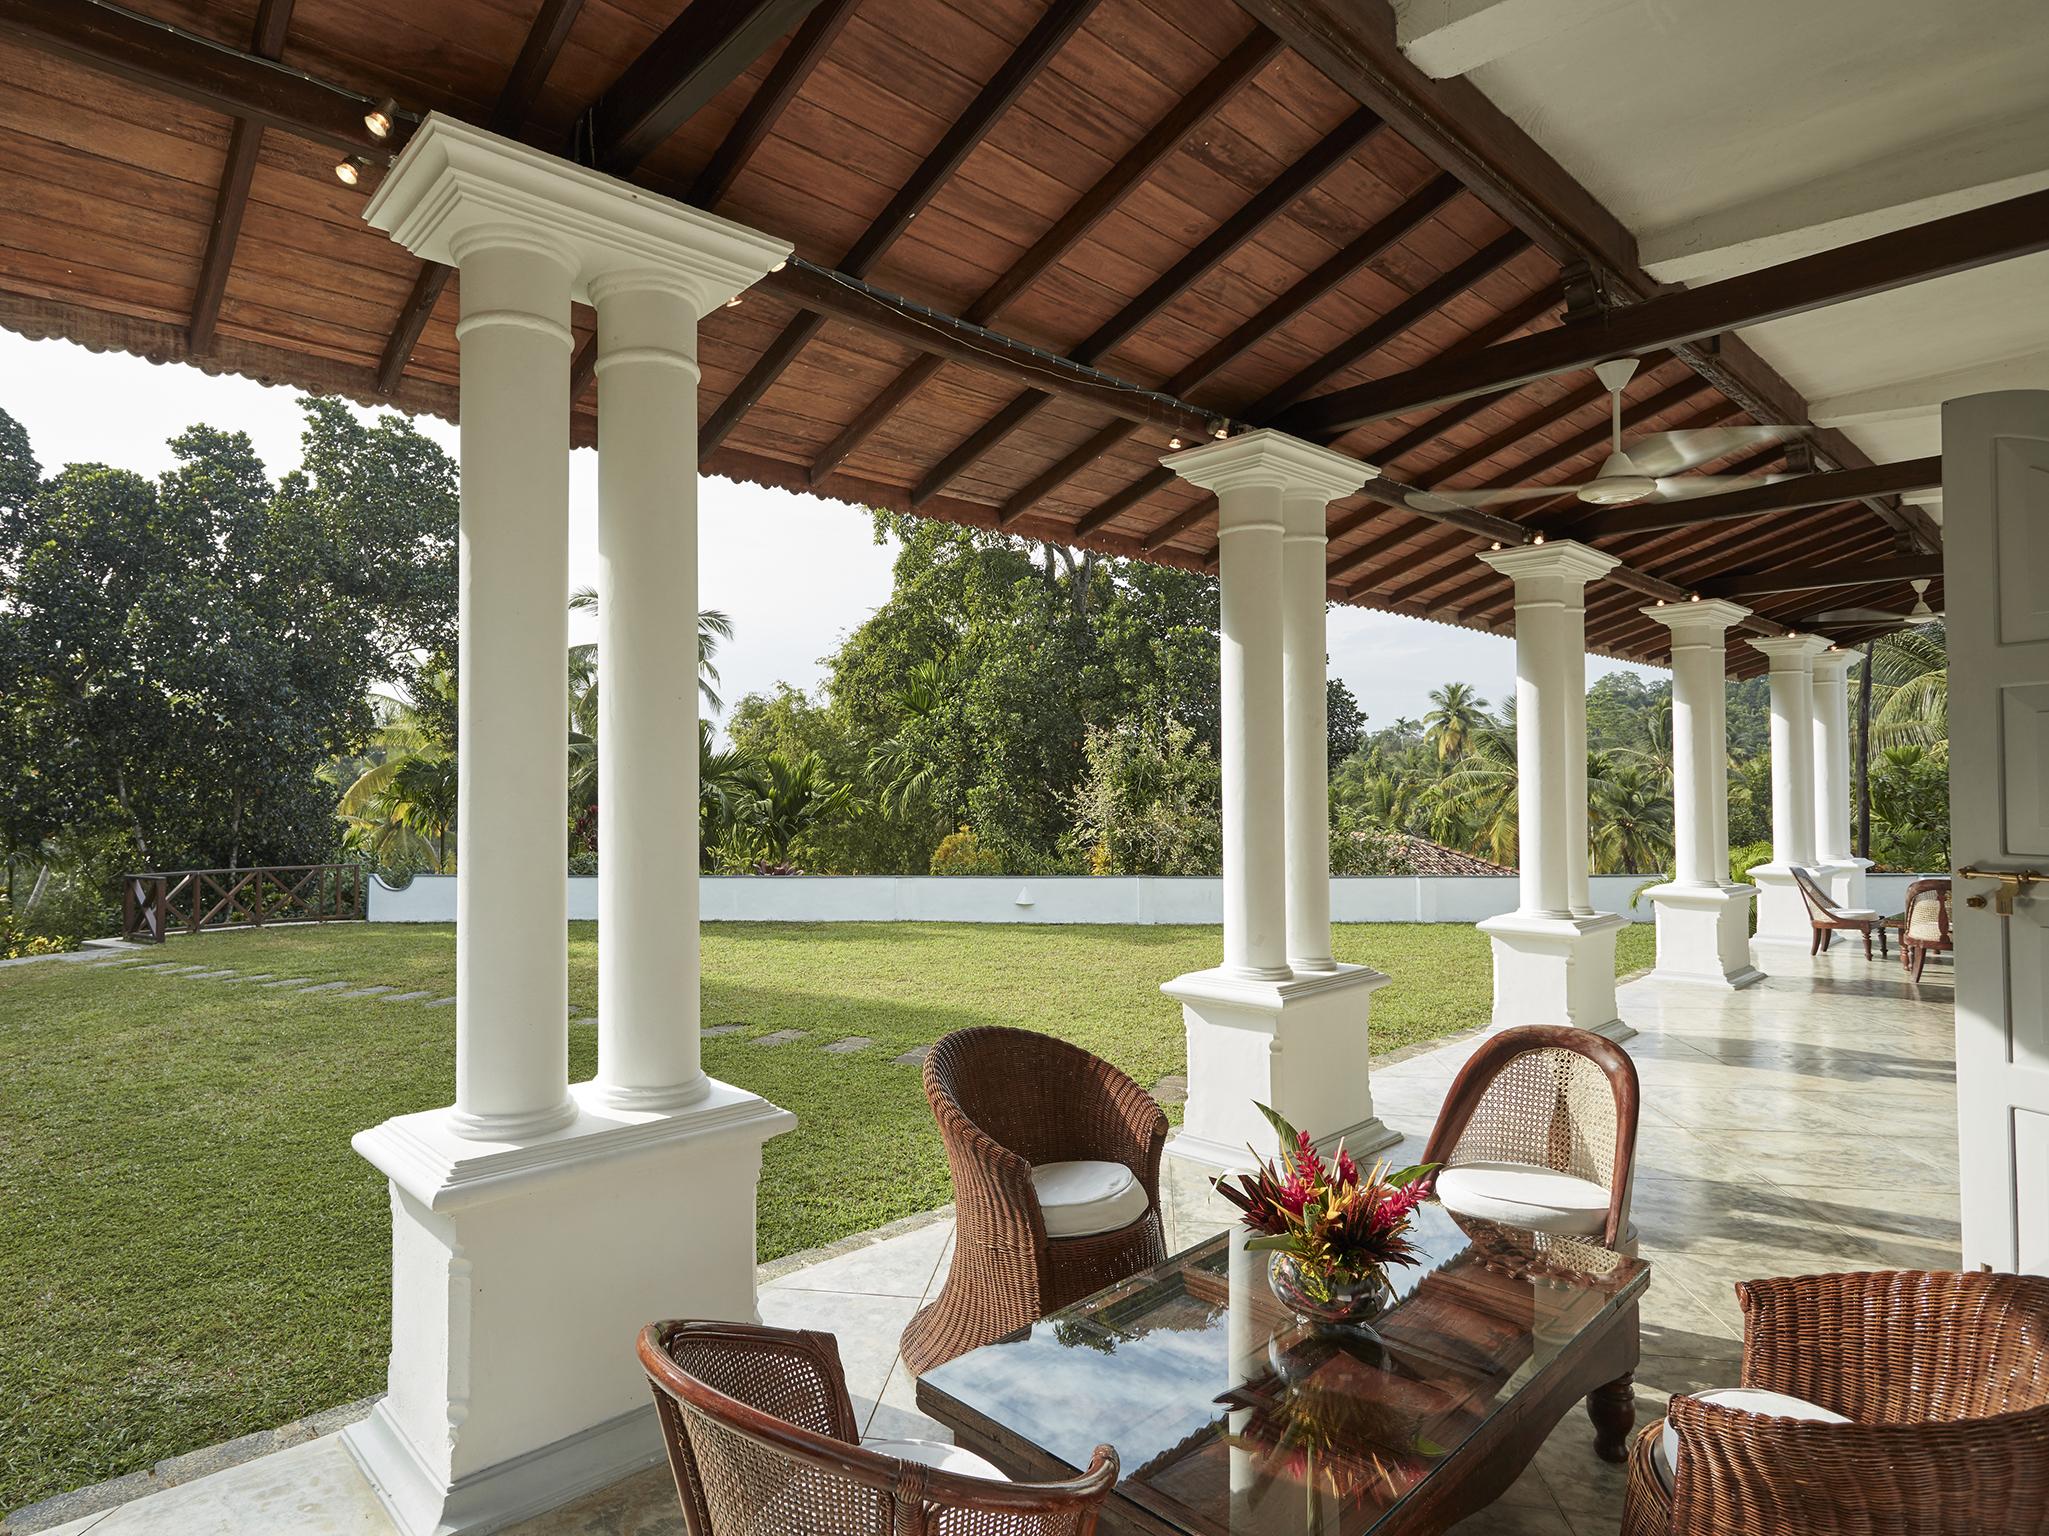 02-Pooja Kanda -Front terrace.jpg